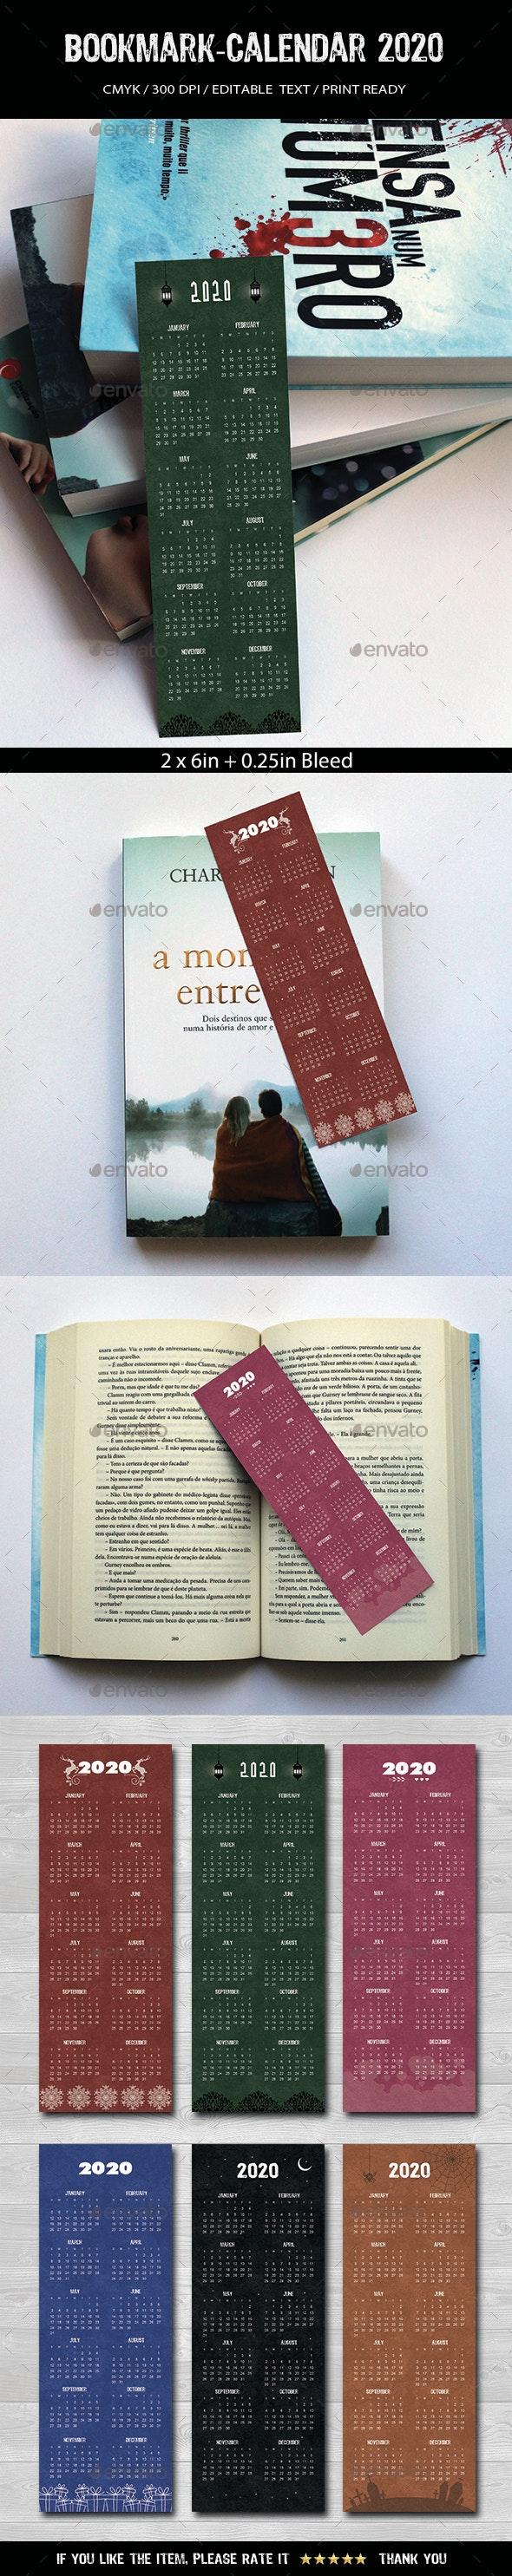 Bookmark-Calendar 2020 - Miscellaneous Print Templates